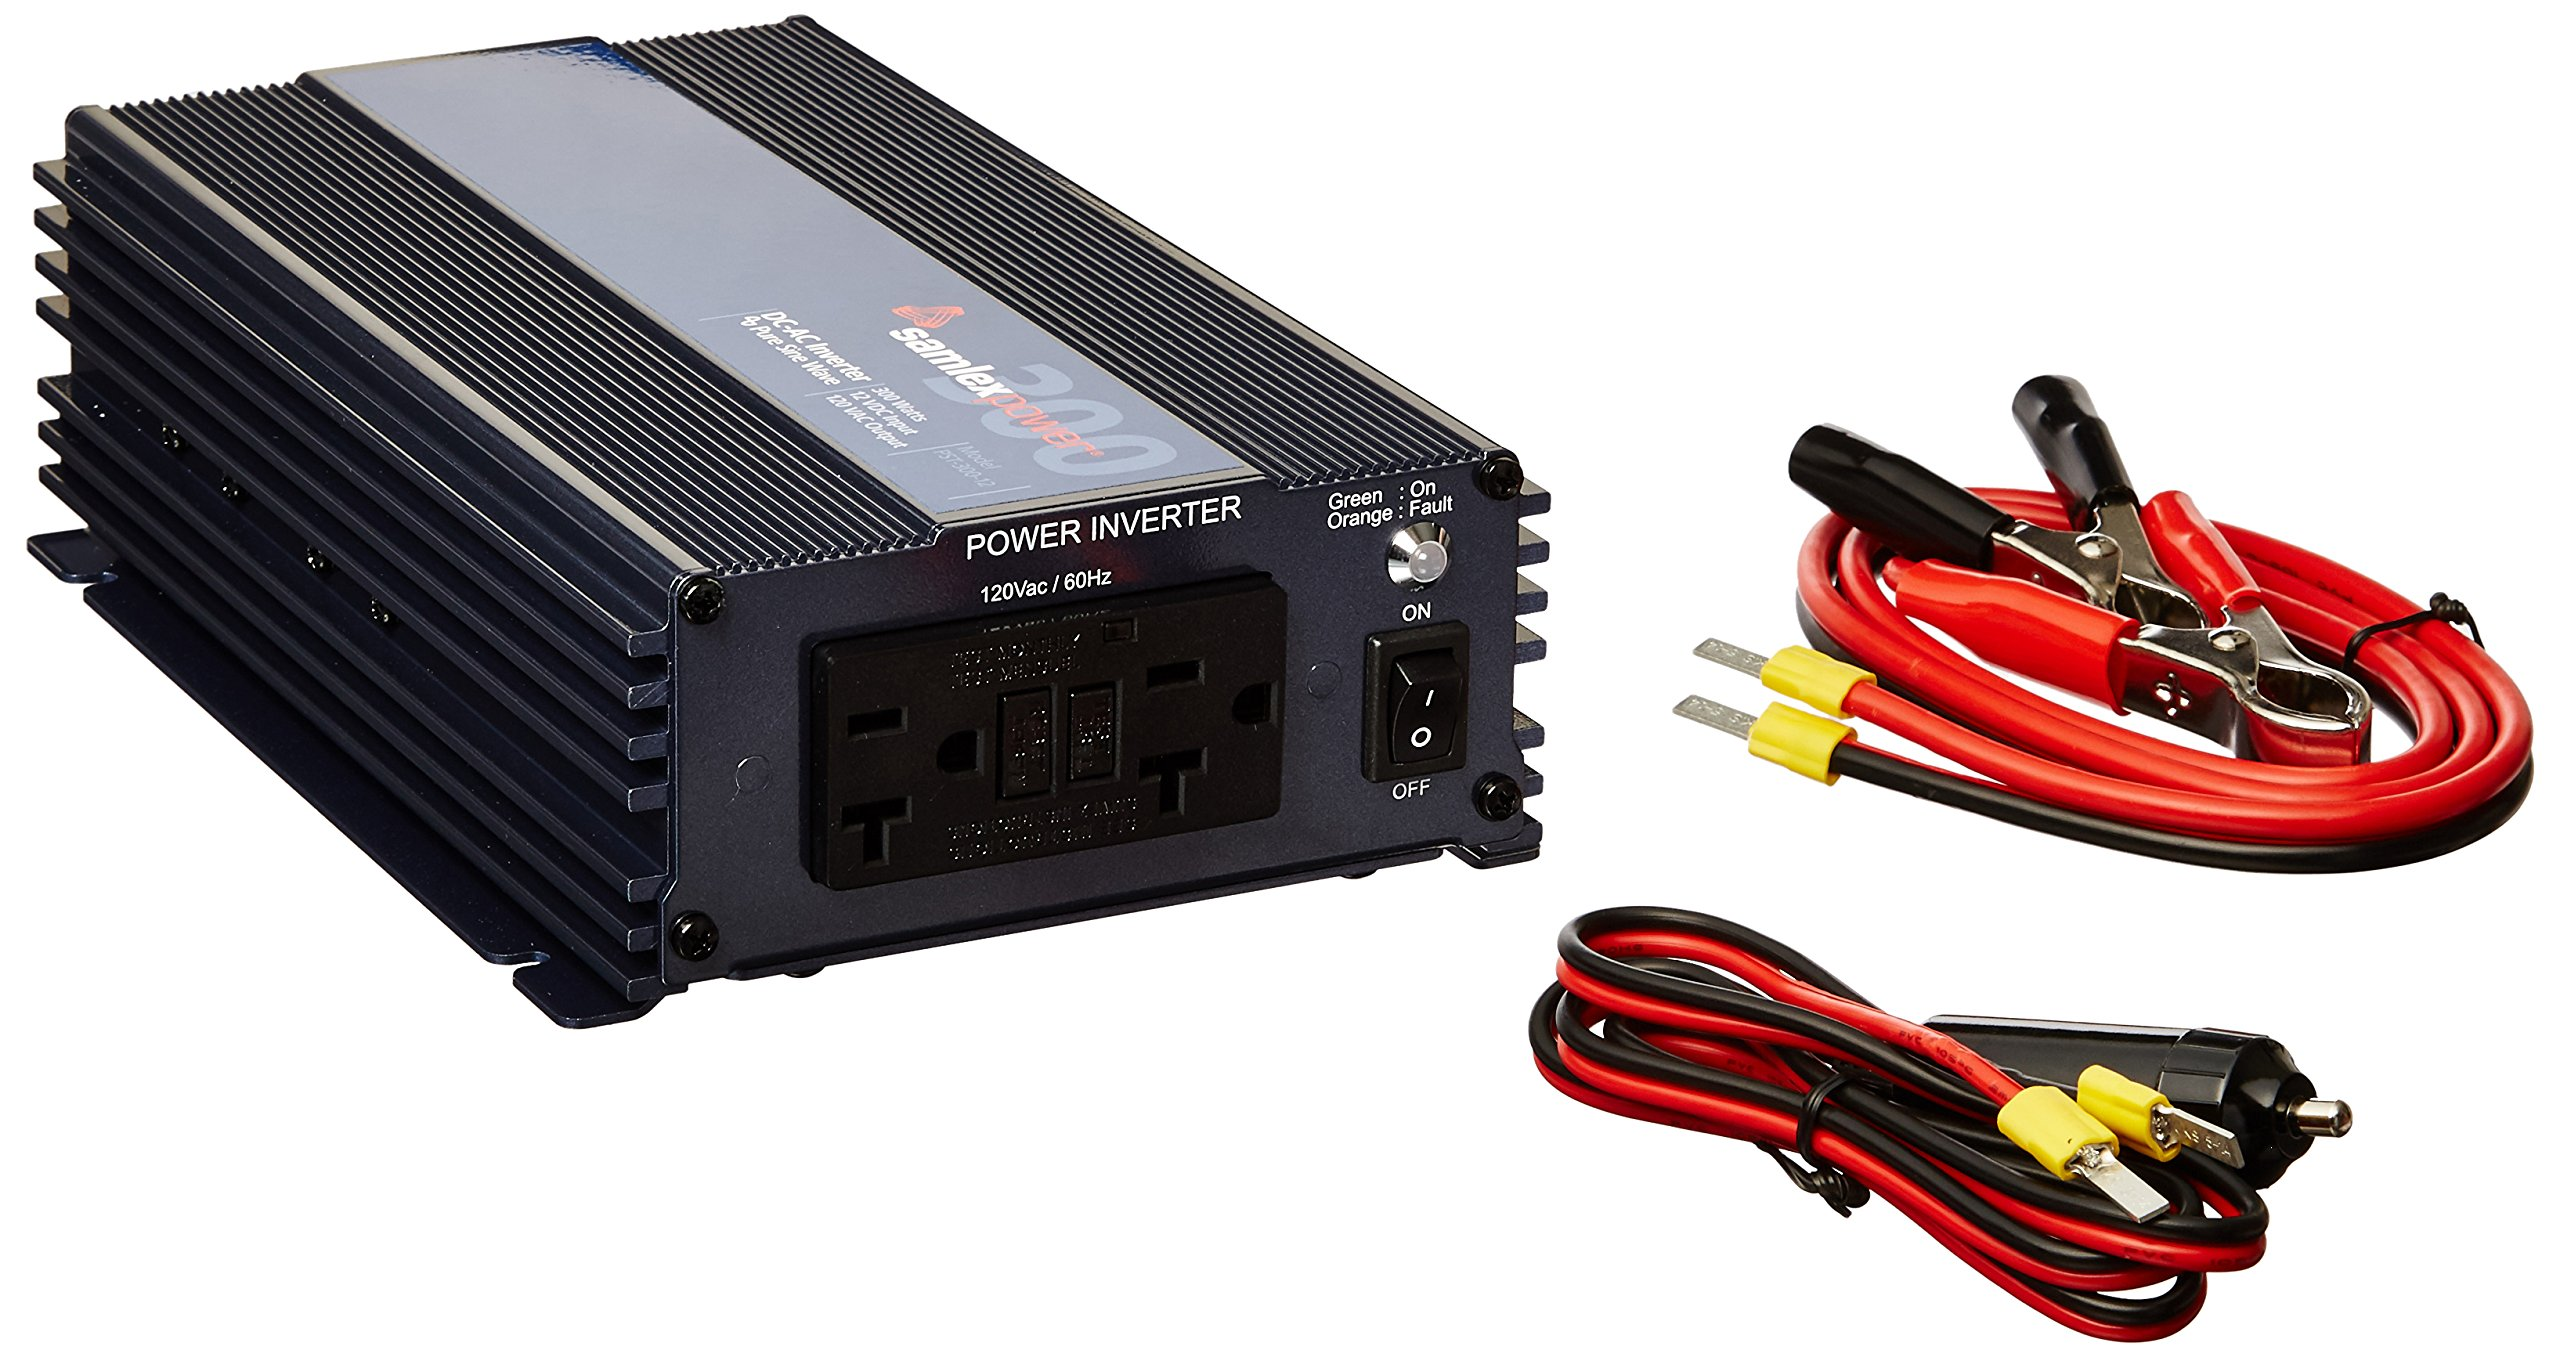 Samlex Solar PST-300-12 PST Series Pure Sine Wave Inverter